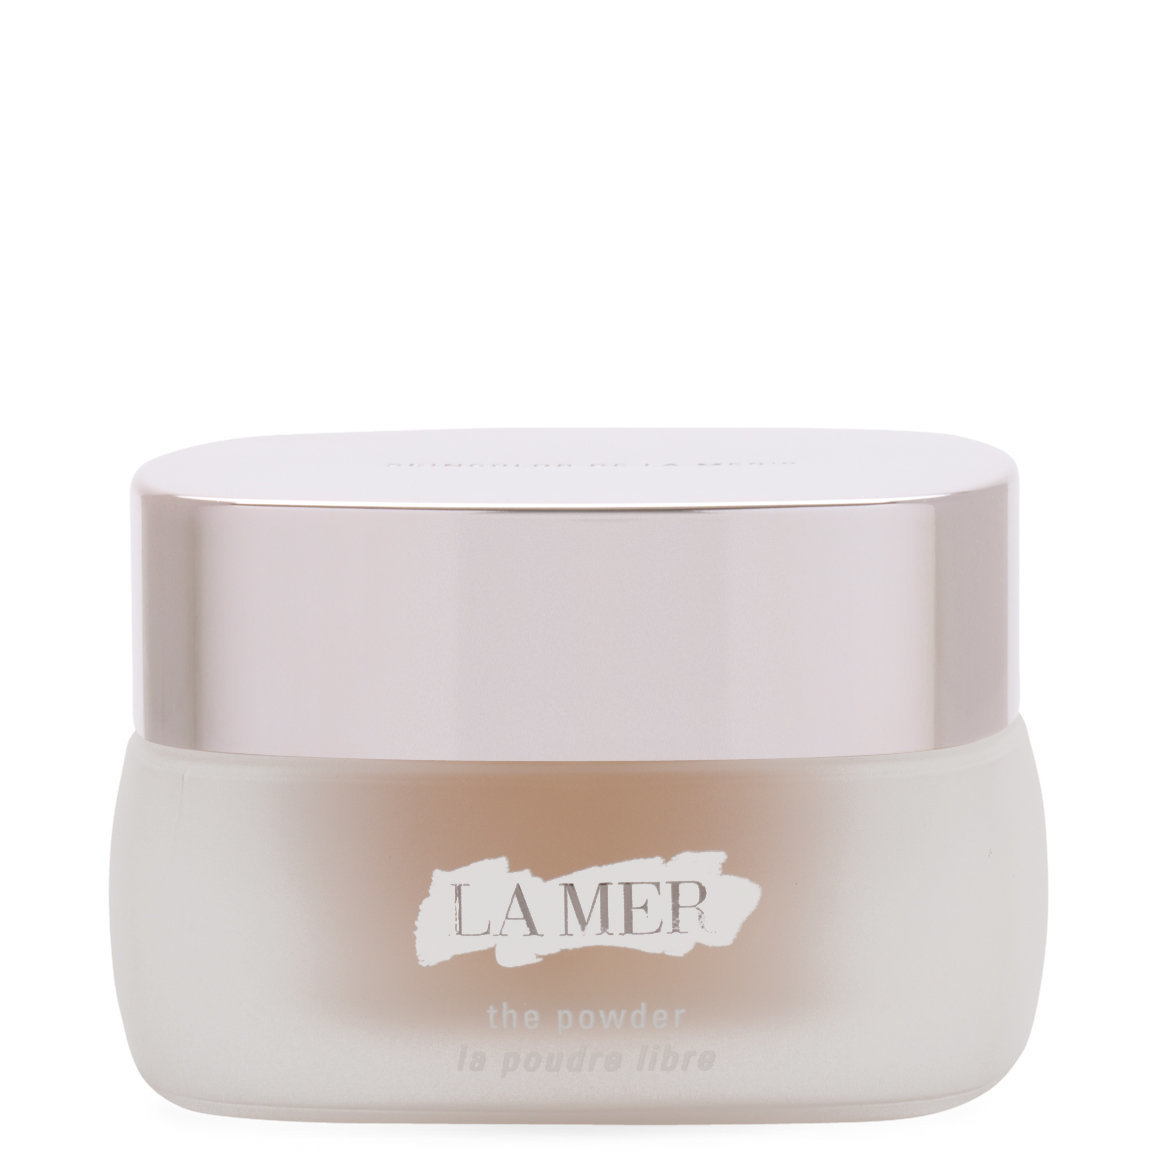 La Mer The Powder product swatch.